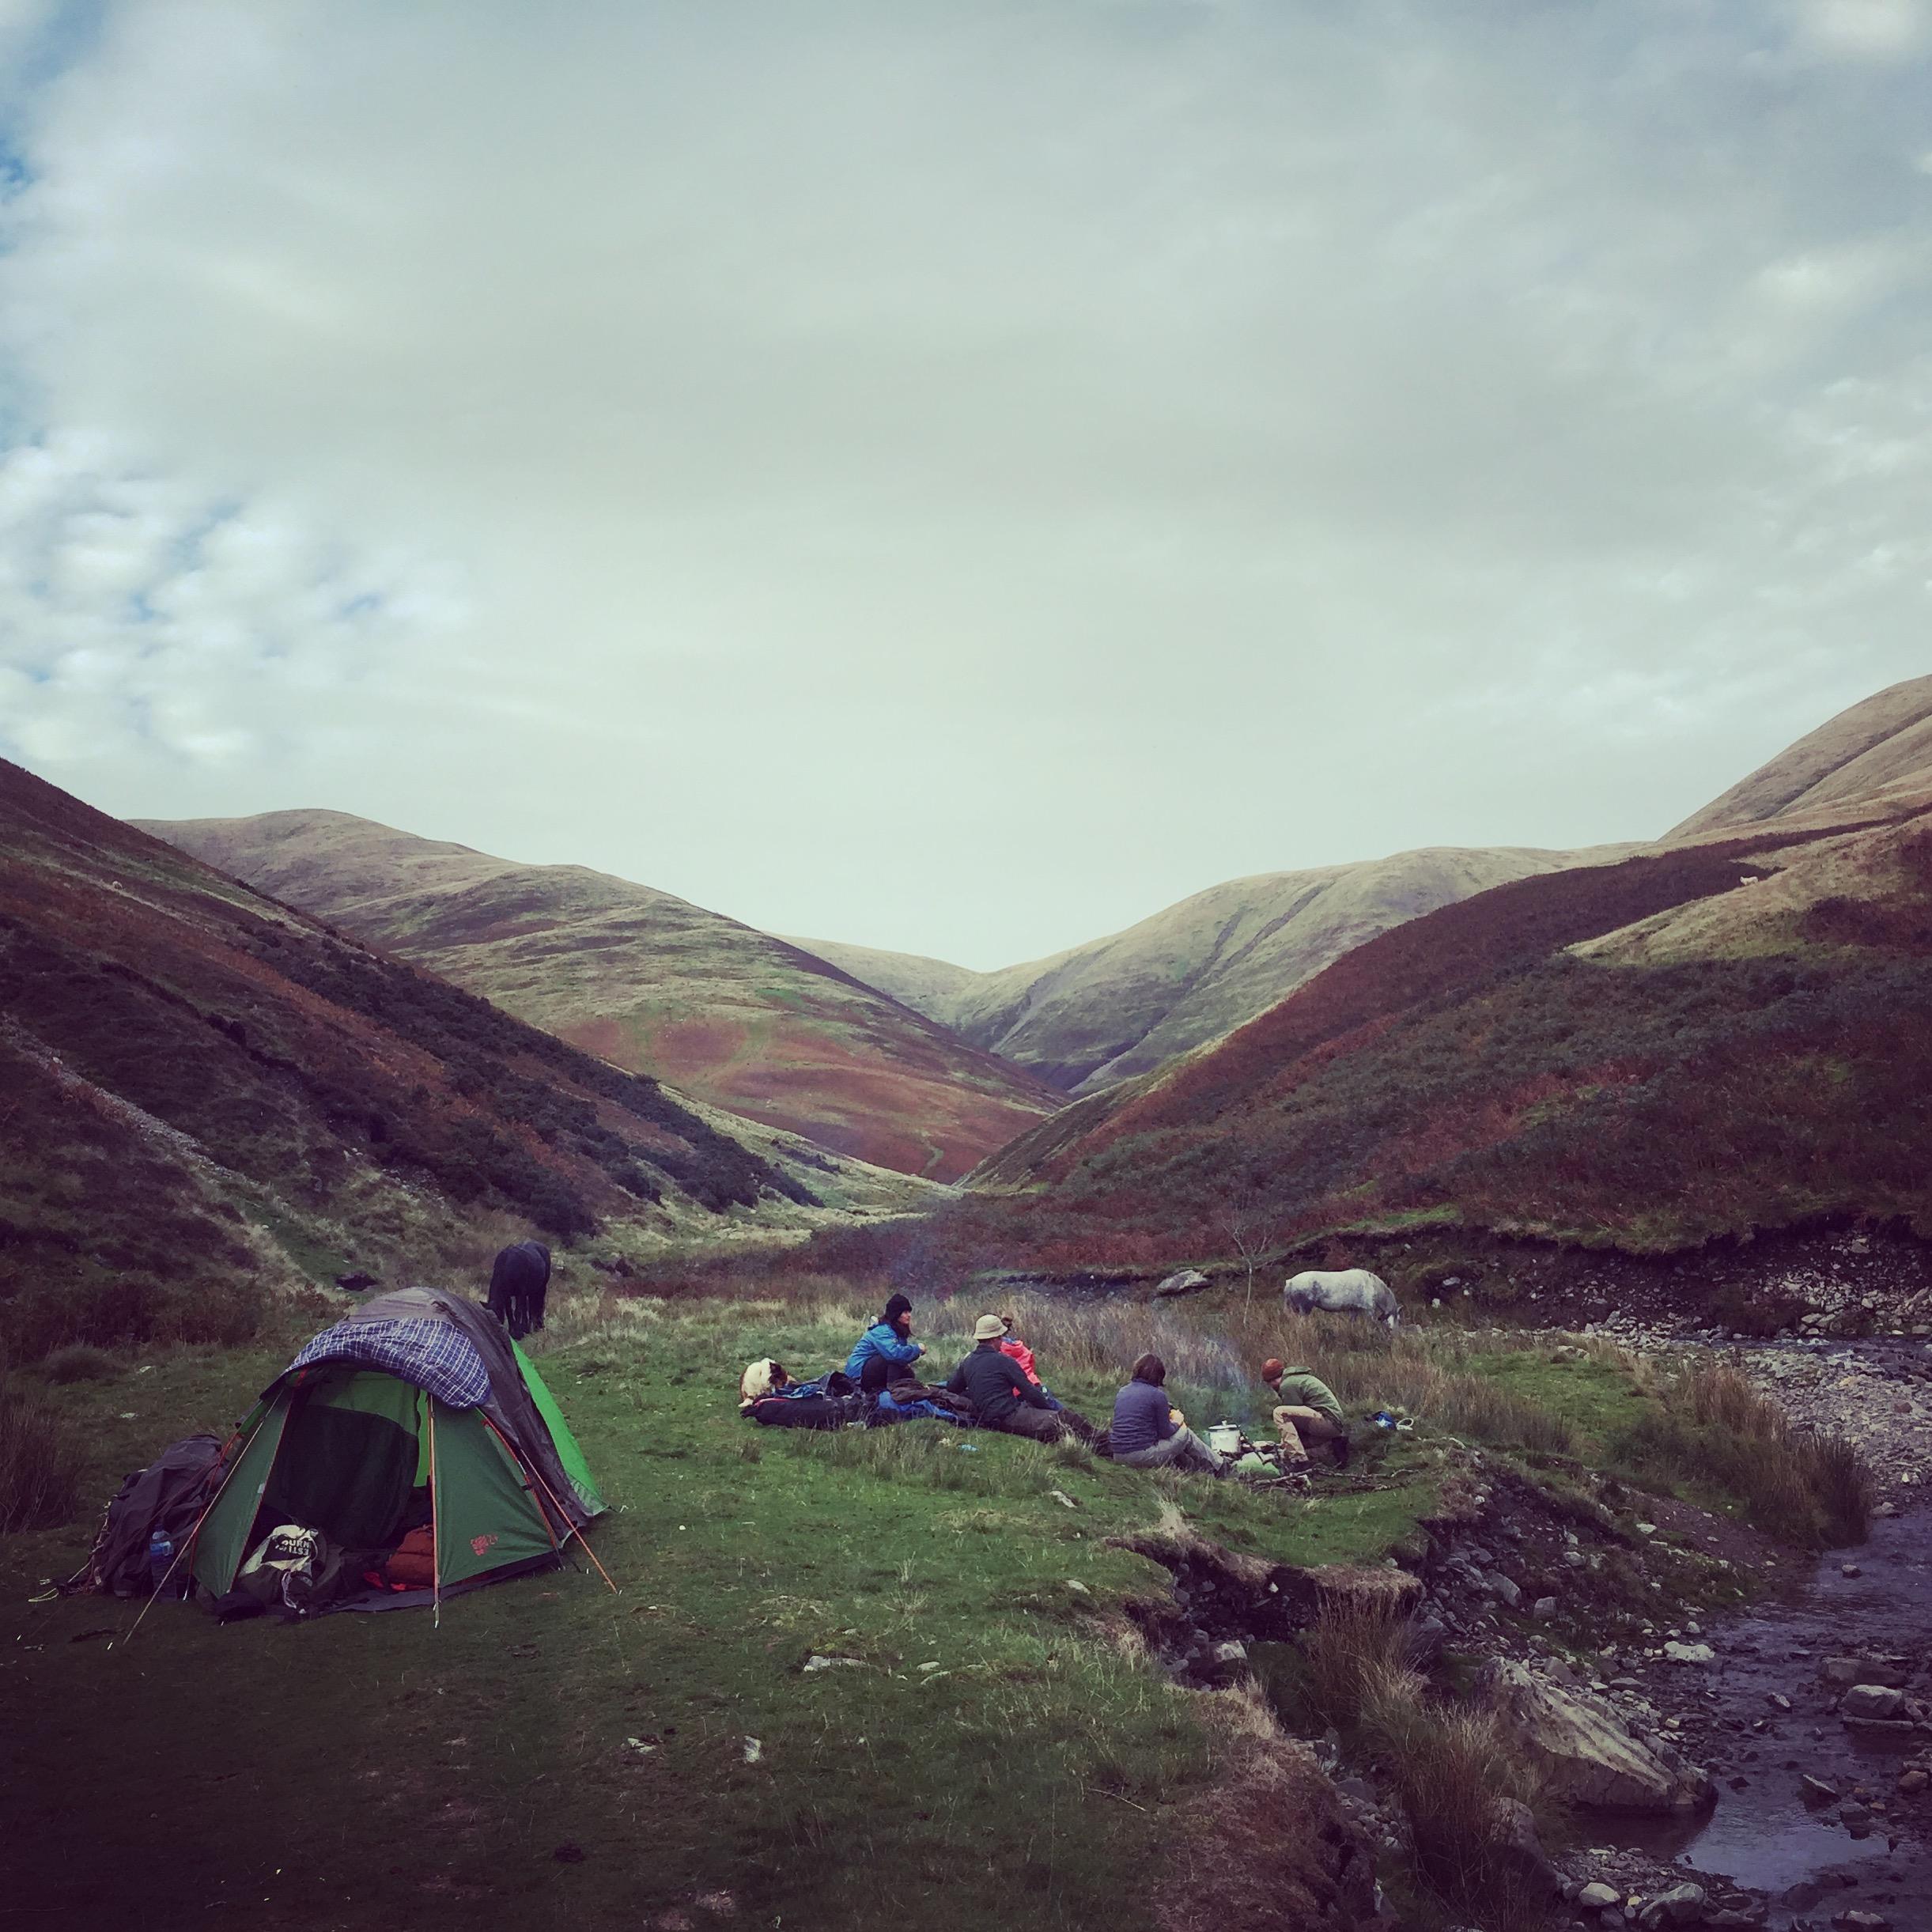 Camp 1 at the foot of The Calf (photo Tom LLoyd)